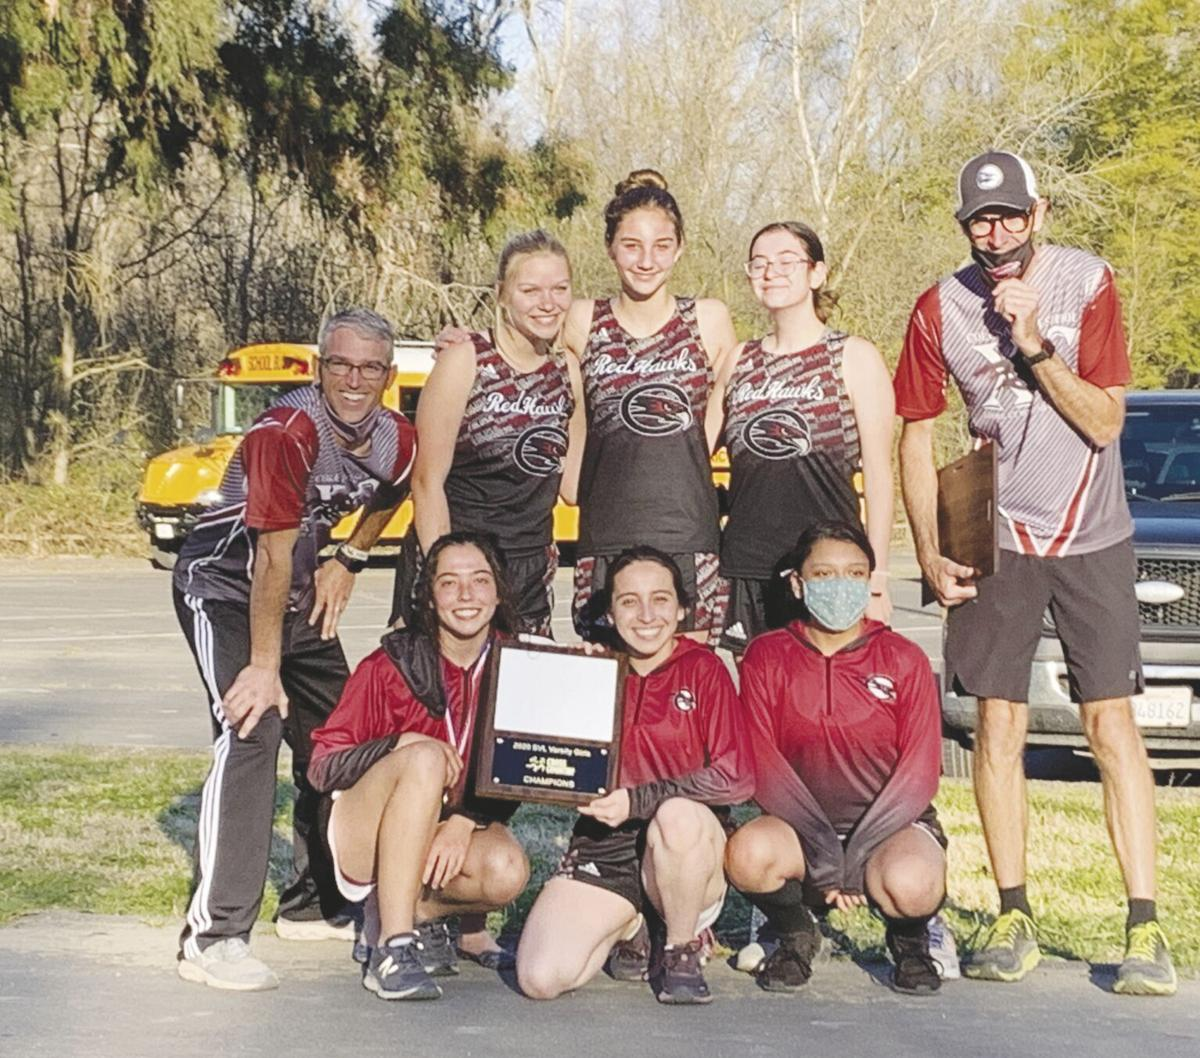 Colusa pursuing outdoor spring sports